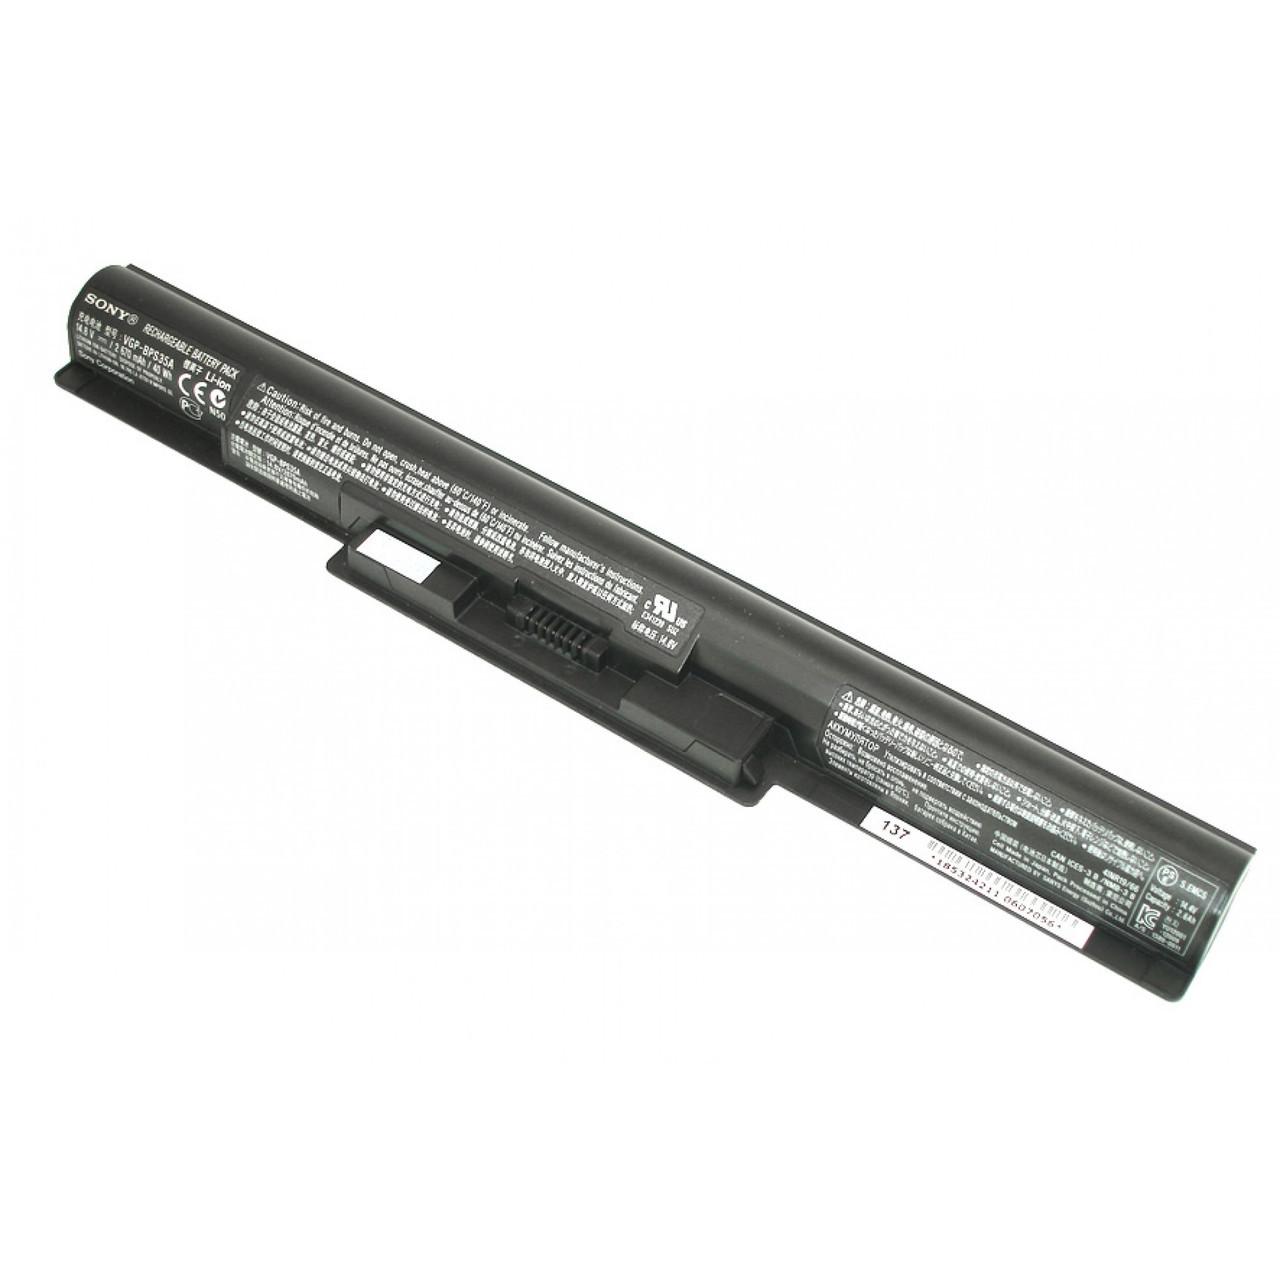 Аккумулятор для ноутбука Sony SVF153A1YV (14.8V 2200 mAh)